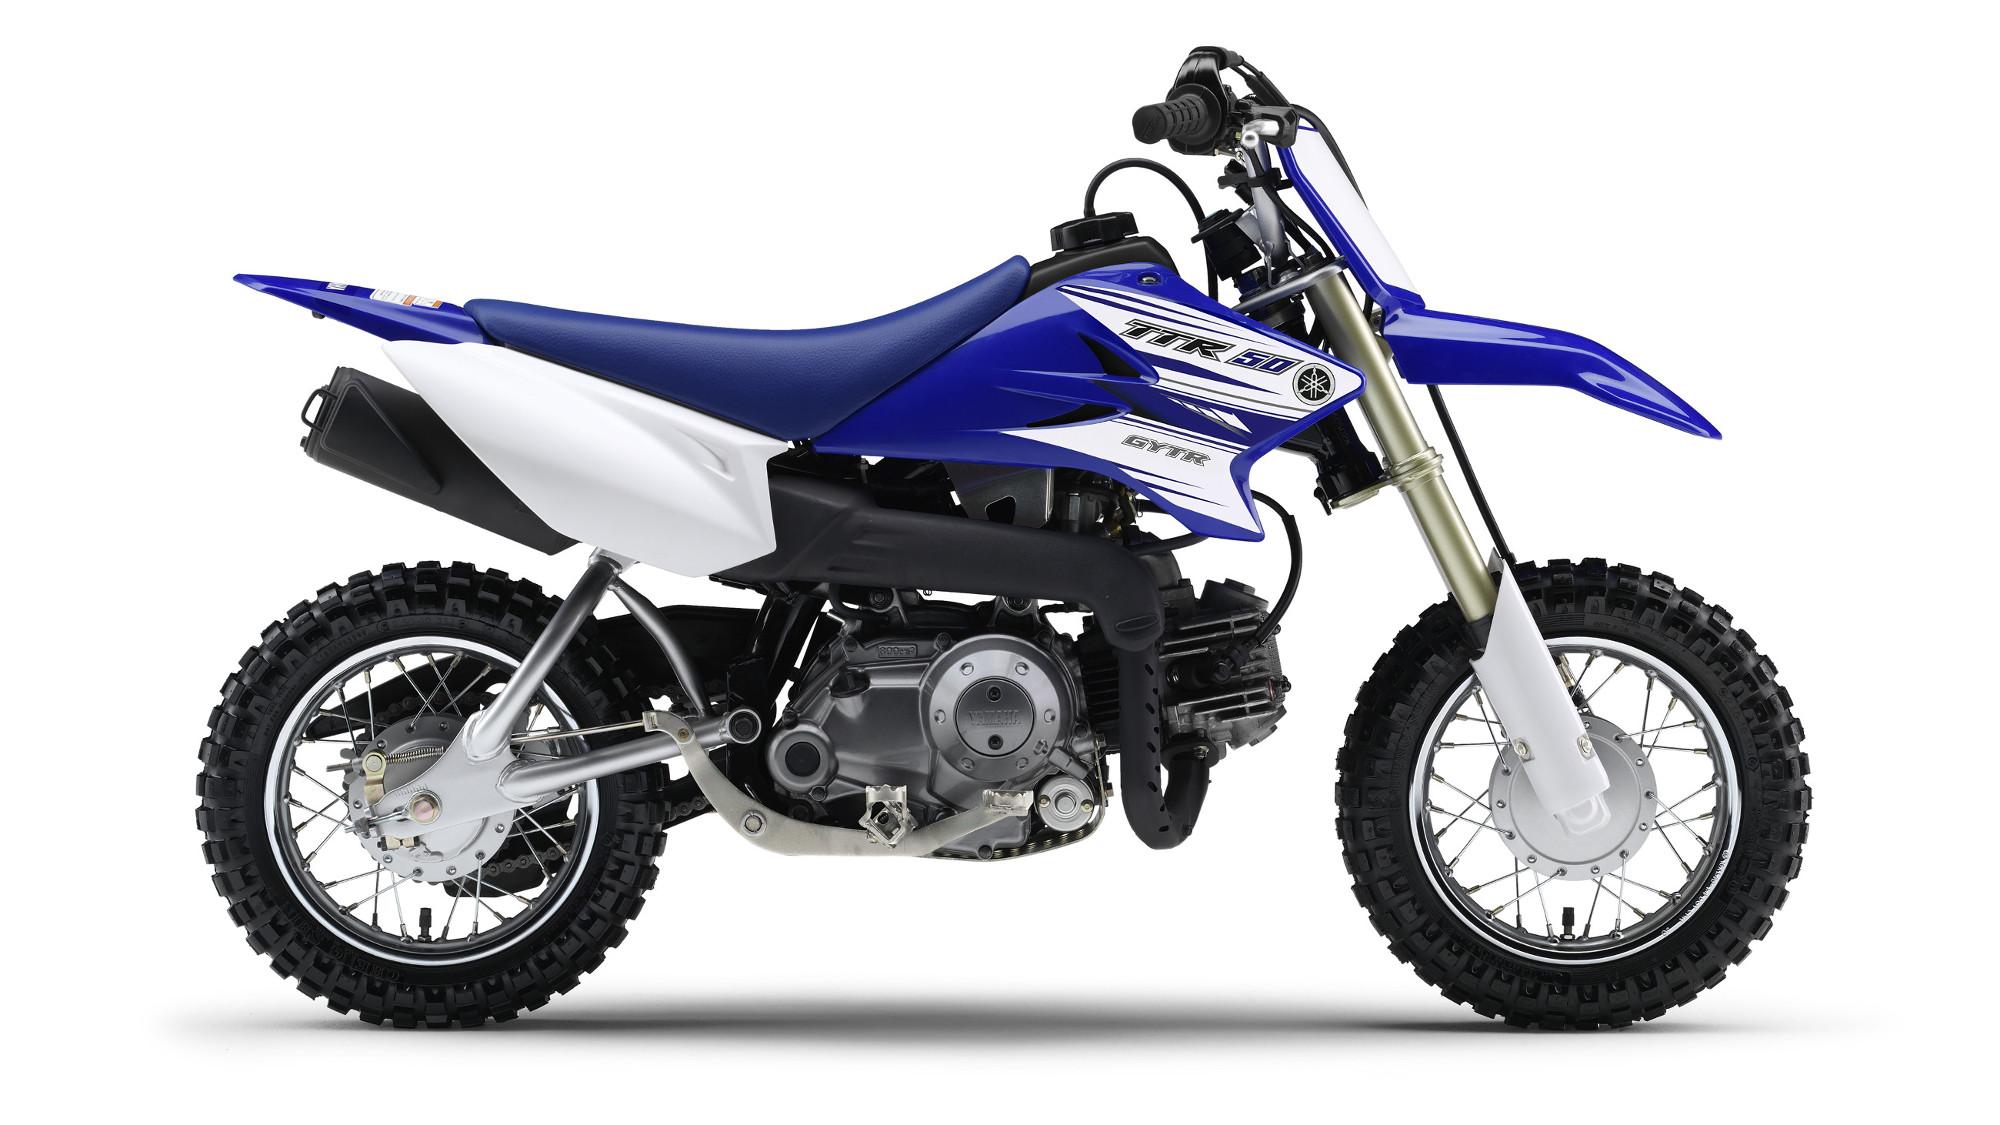 2016 Yamaha Pw50 Ttr 50e